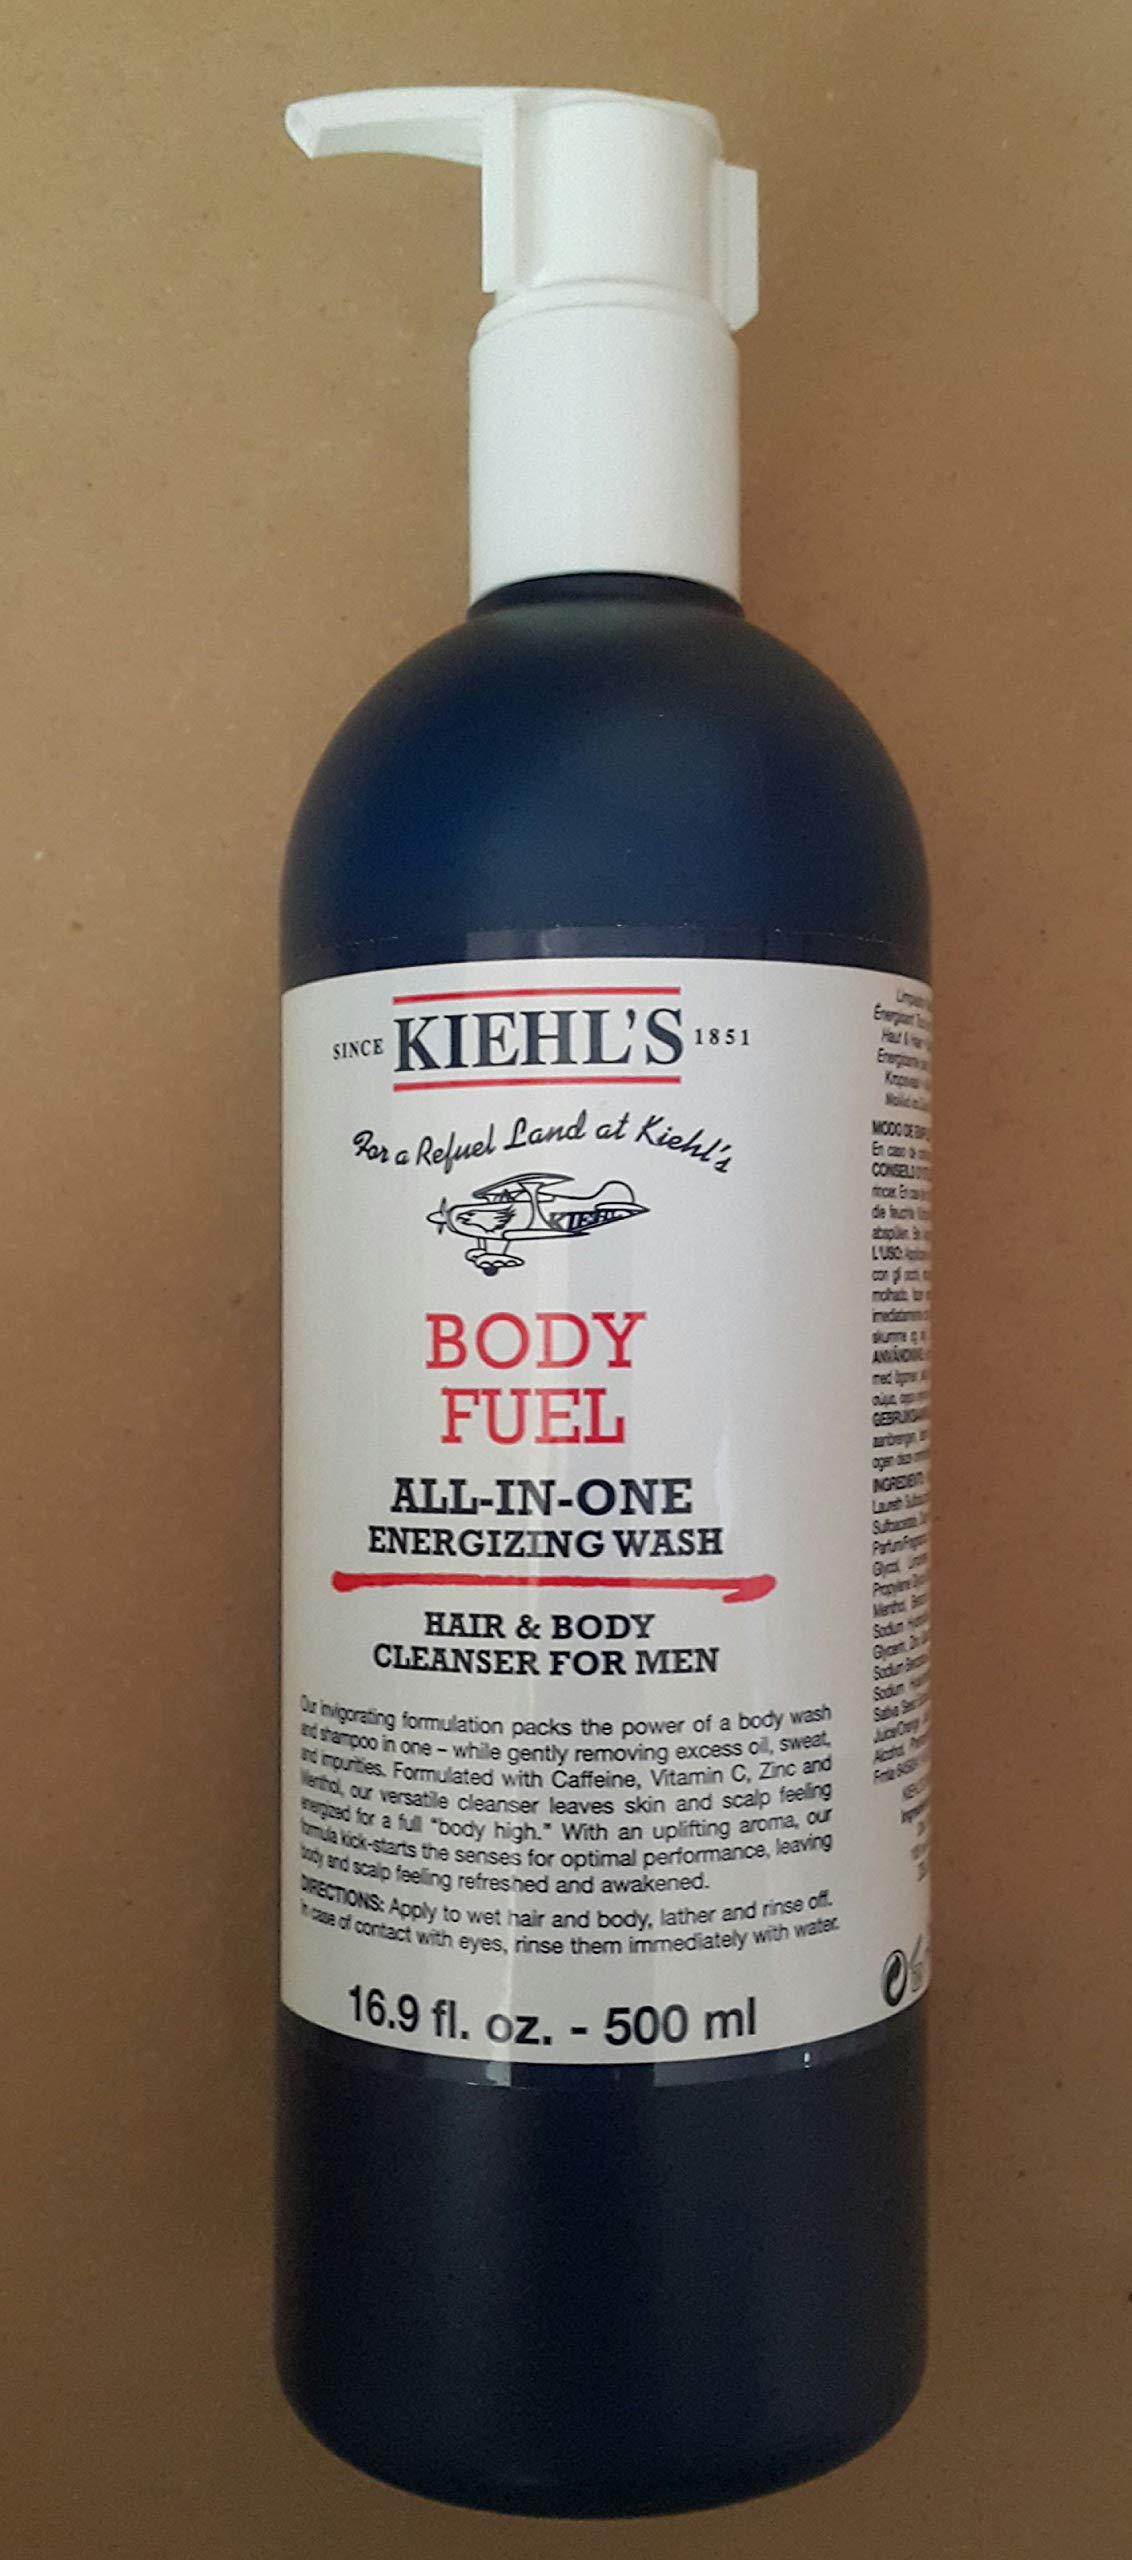 Body Fuel All-In-One Energizing Wash - 16.9oz